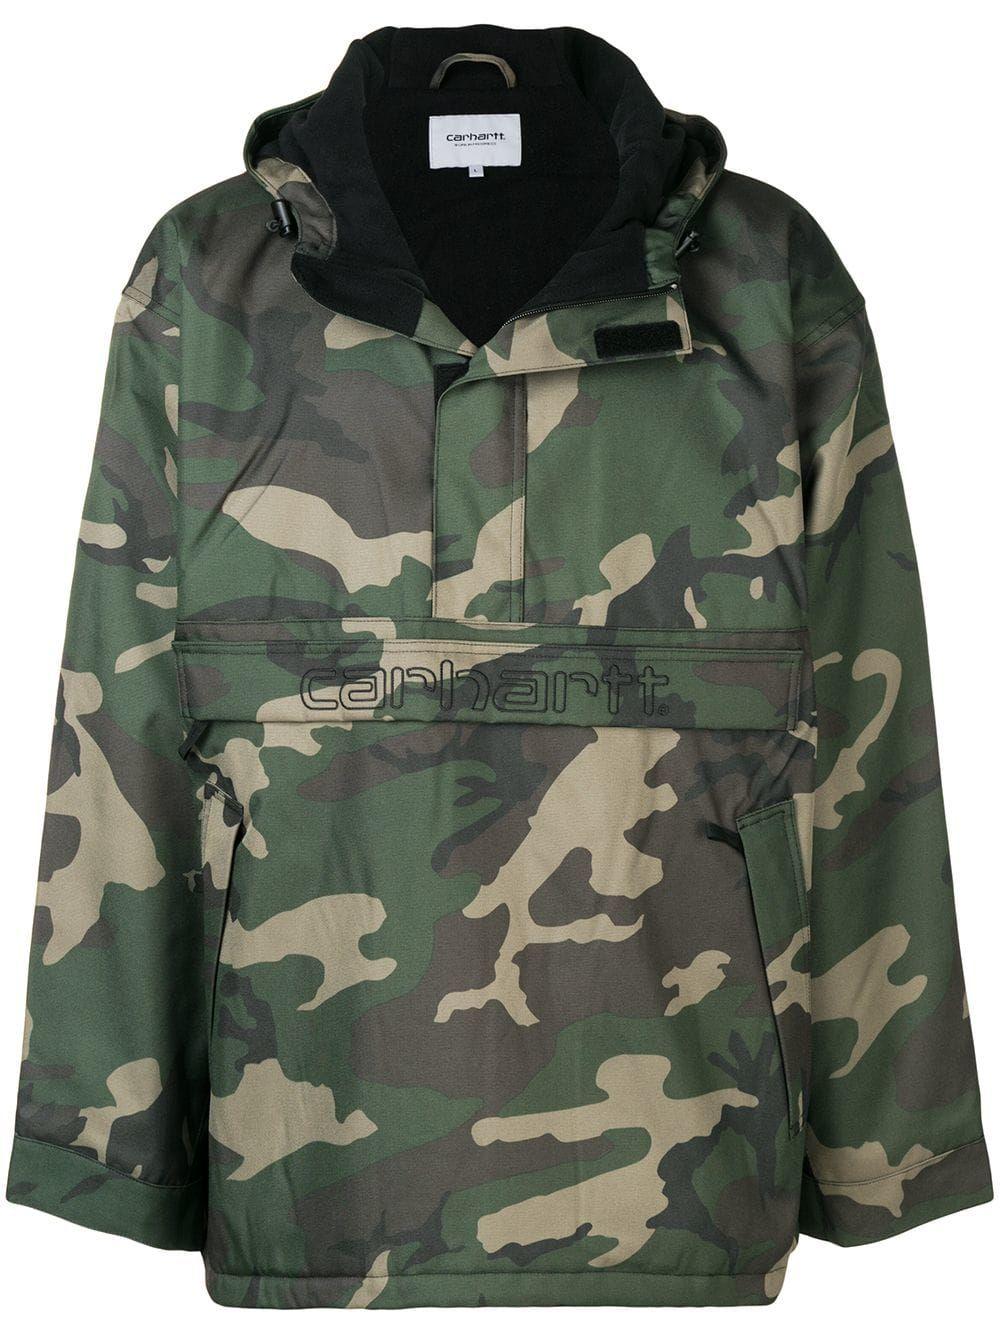 f9ac9899d2a5e CARHARTT CARHARTT HERITAGE CAMOUFLAGE HOODED JACKET - GREEN. #carhartt  #cloth